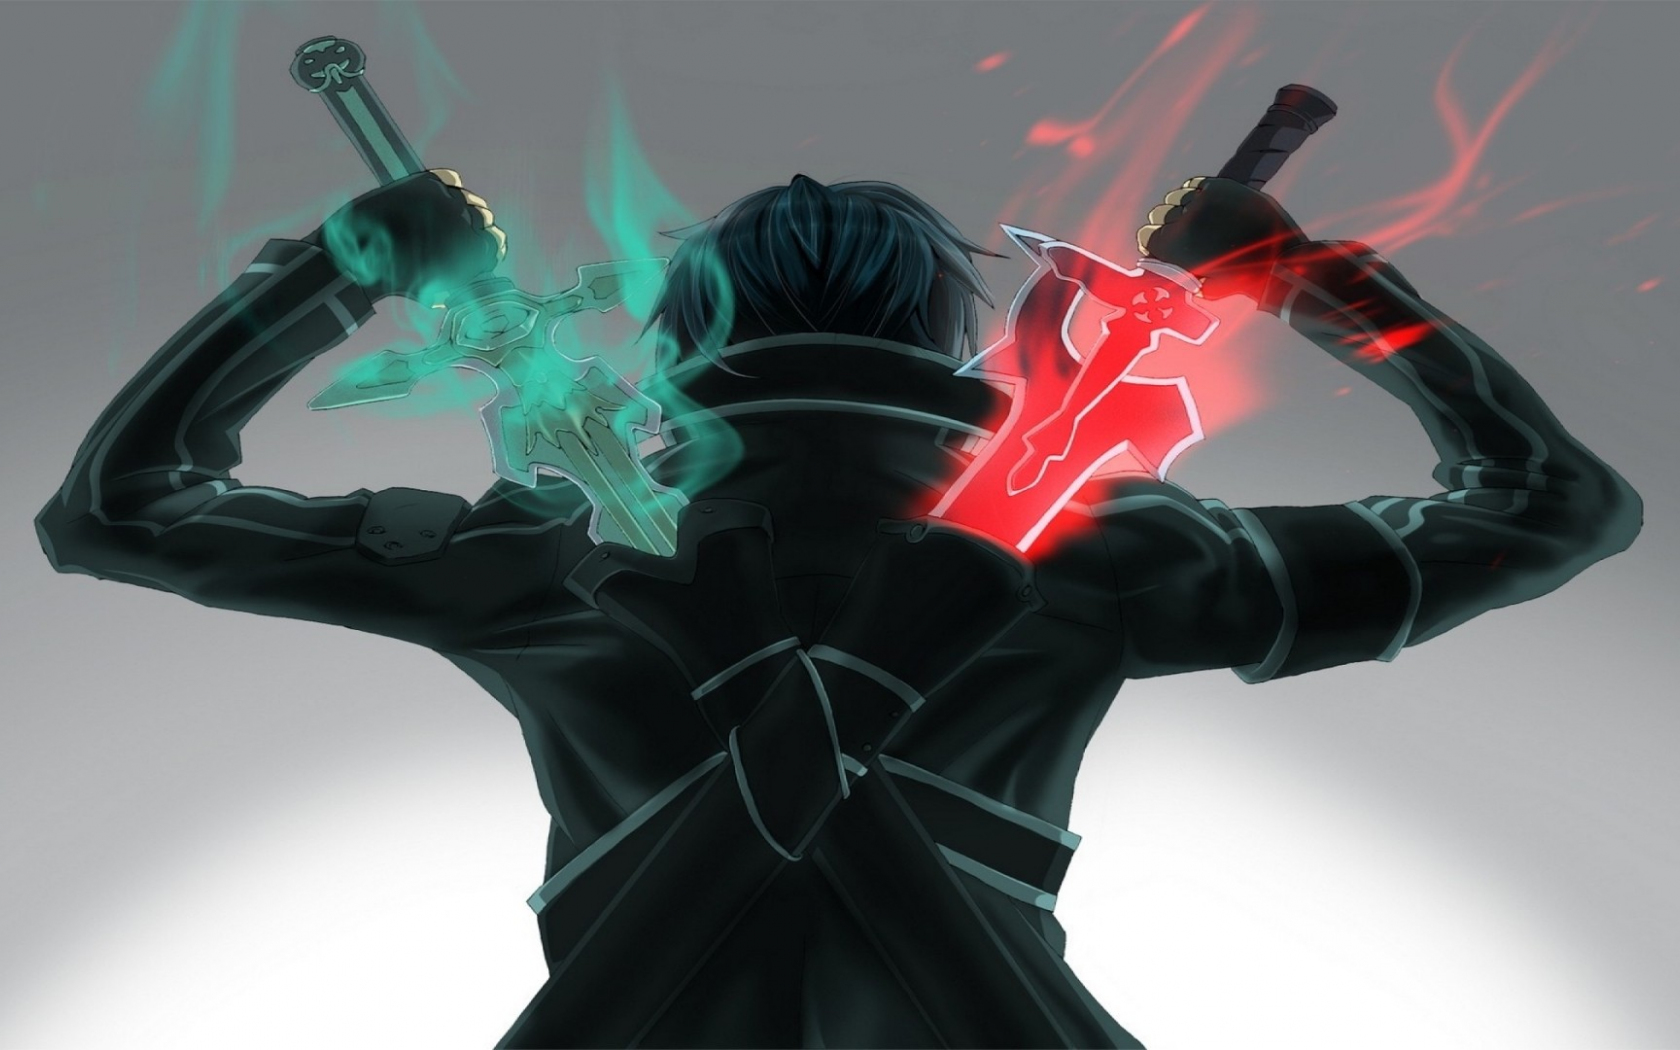 Desktop Wallpaper Kirigaya Kazuto Anime, Hd Image, Picture ...